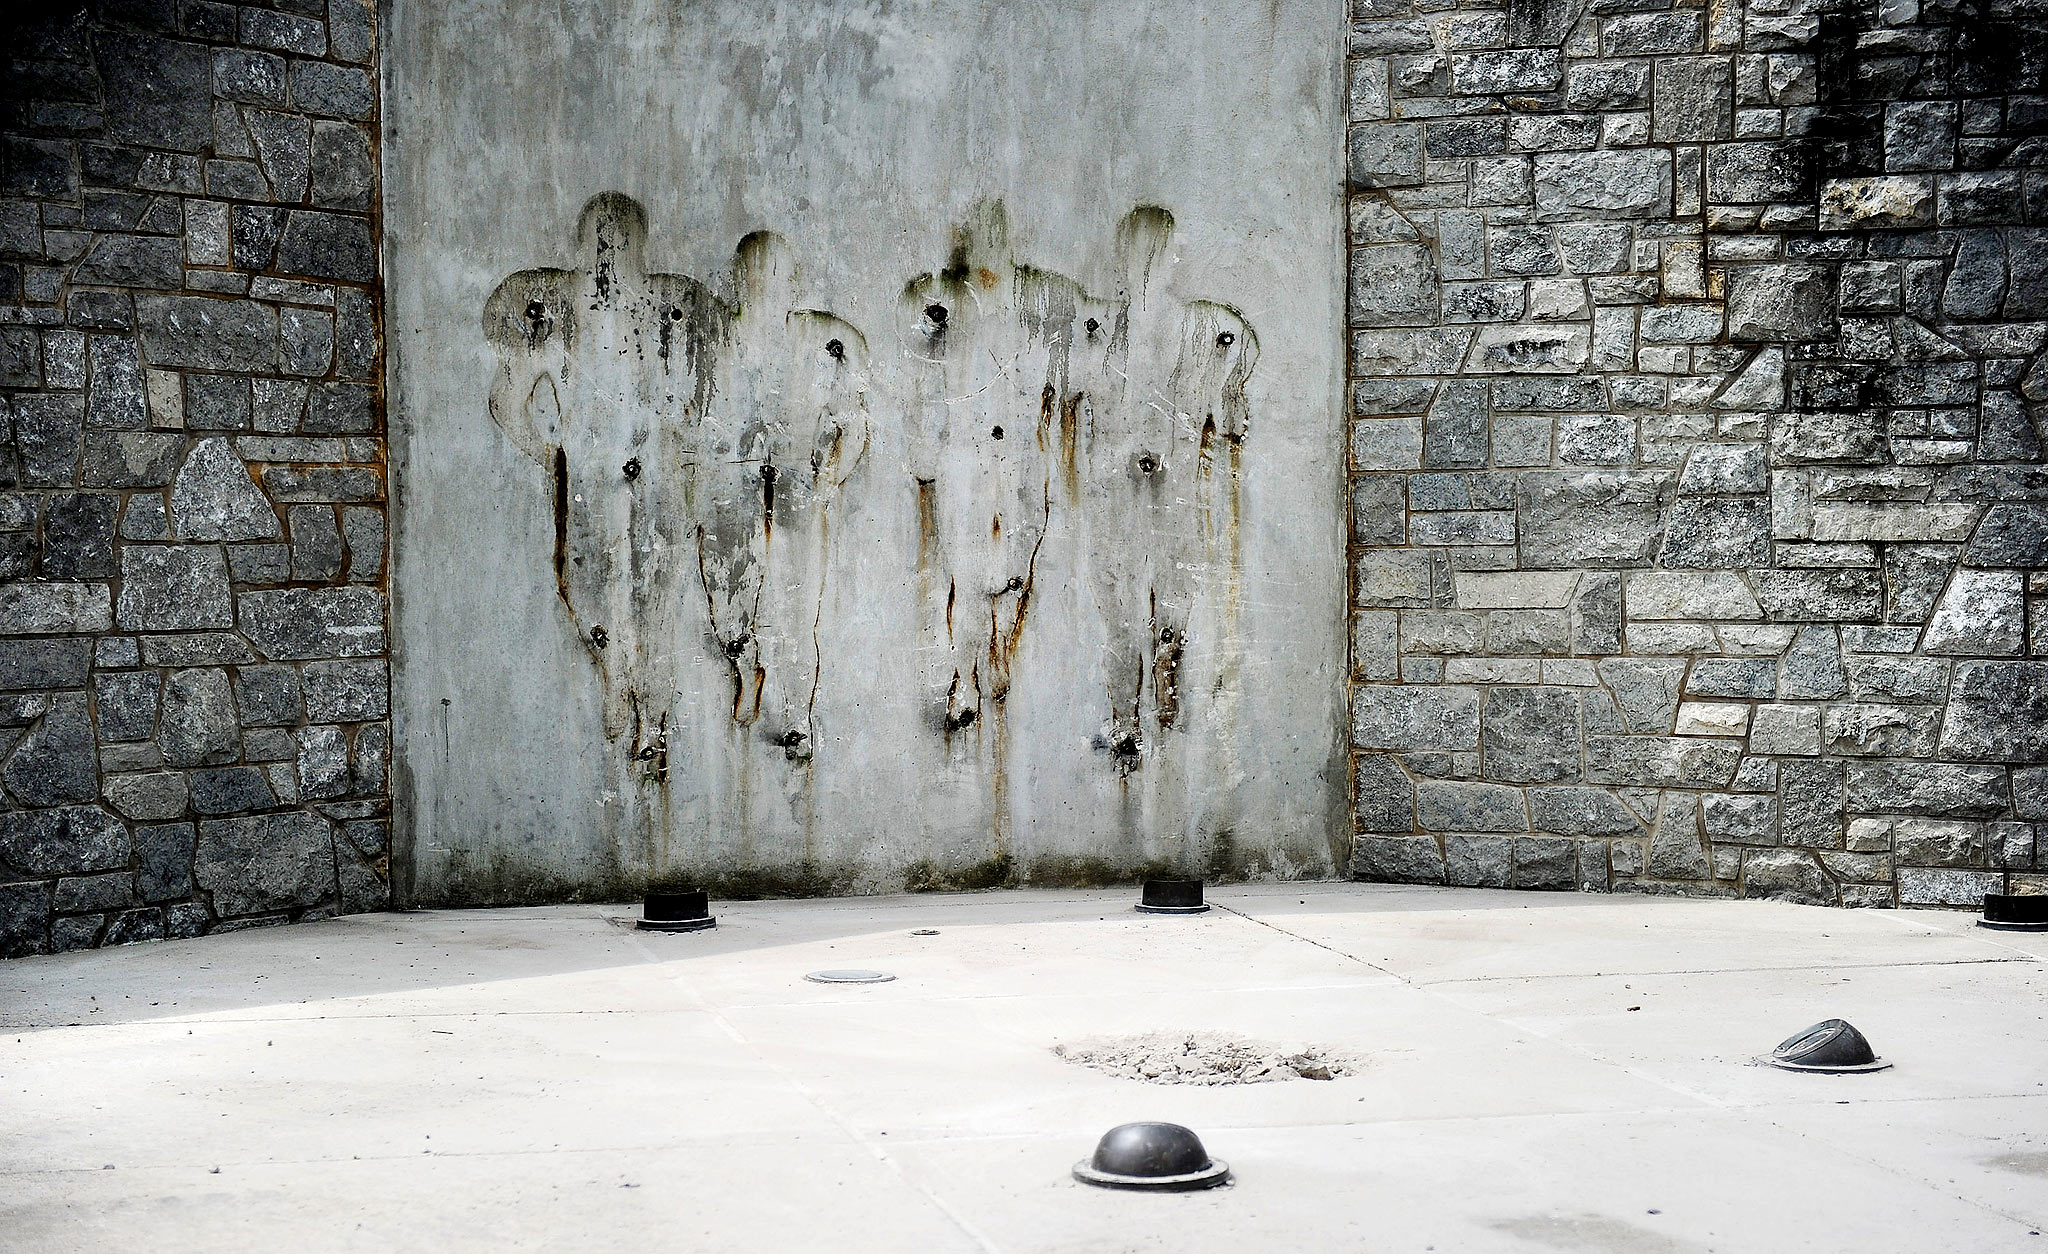 Joe Paterno statue removed